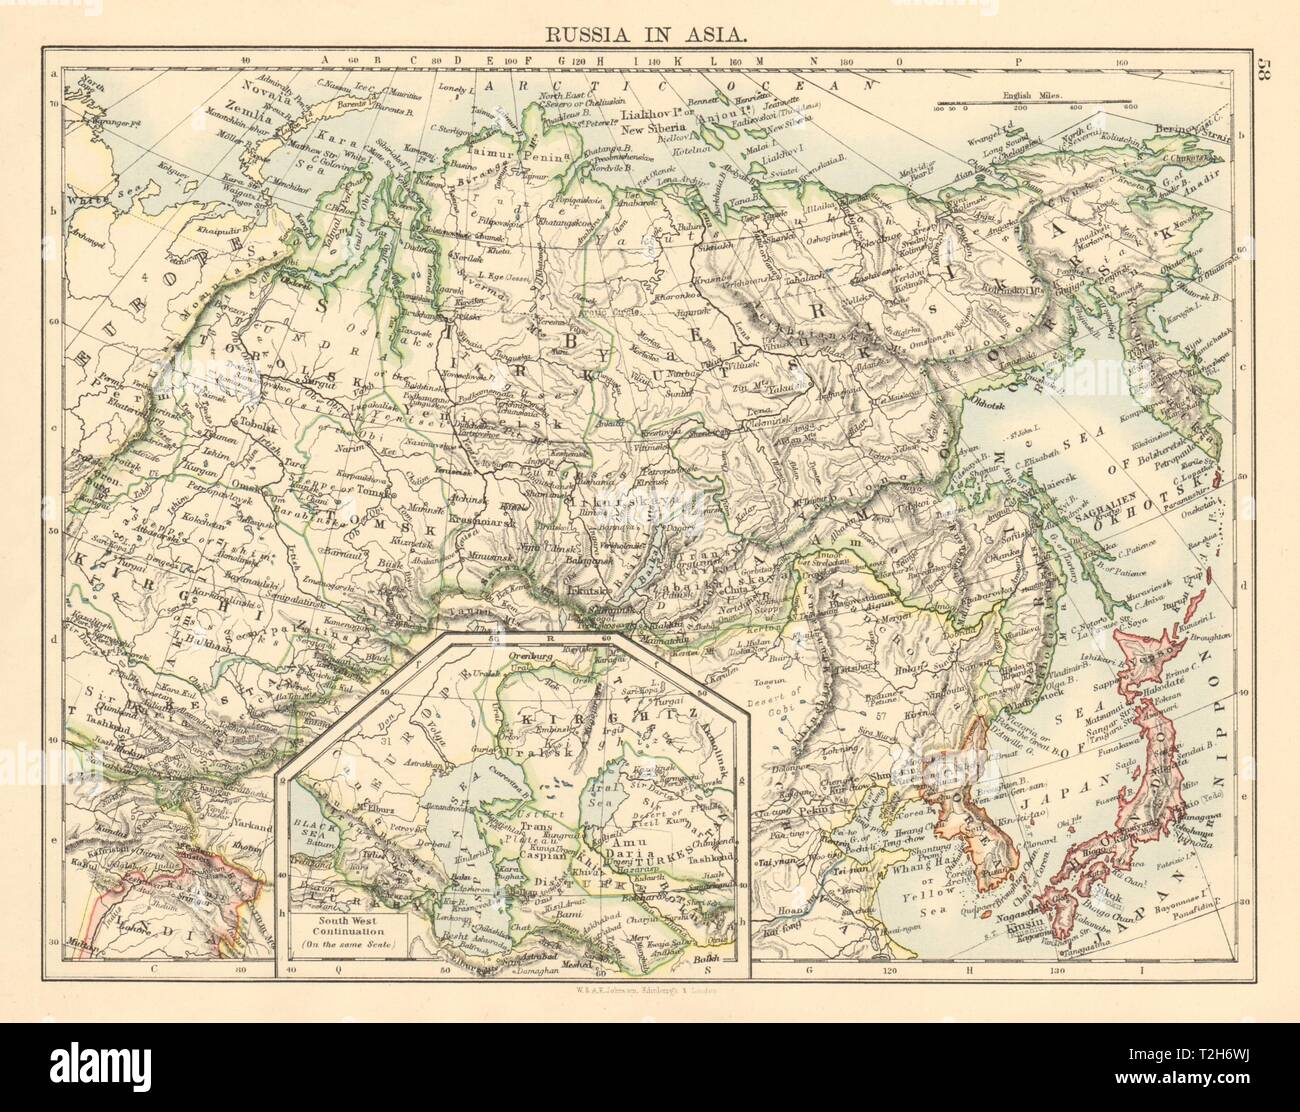 Map Of Asia Seas.Russia In Asia Siberia Caspian Aral Seas Korea Japan Johnston 1892